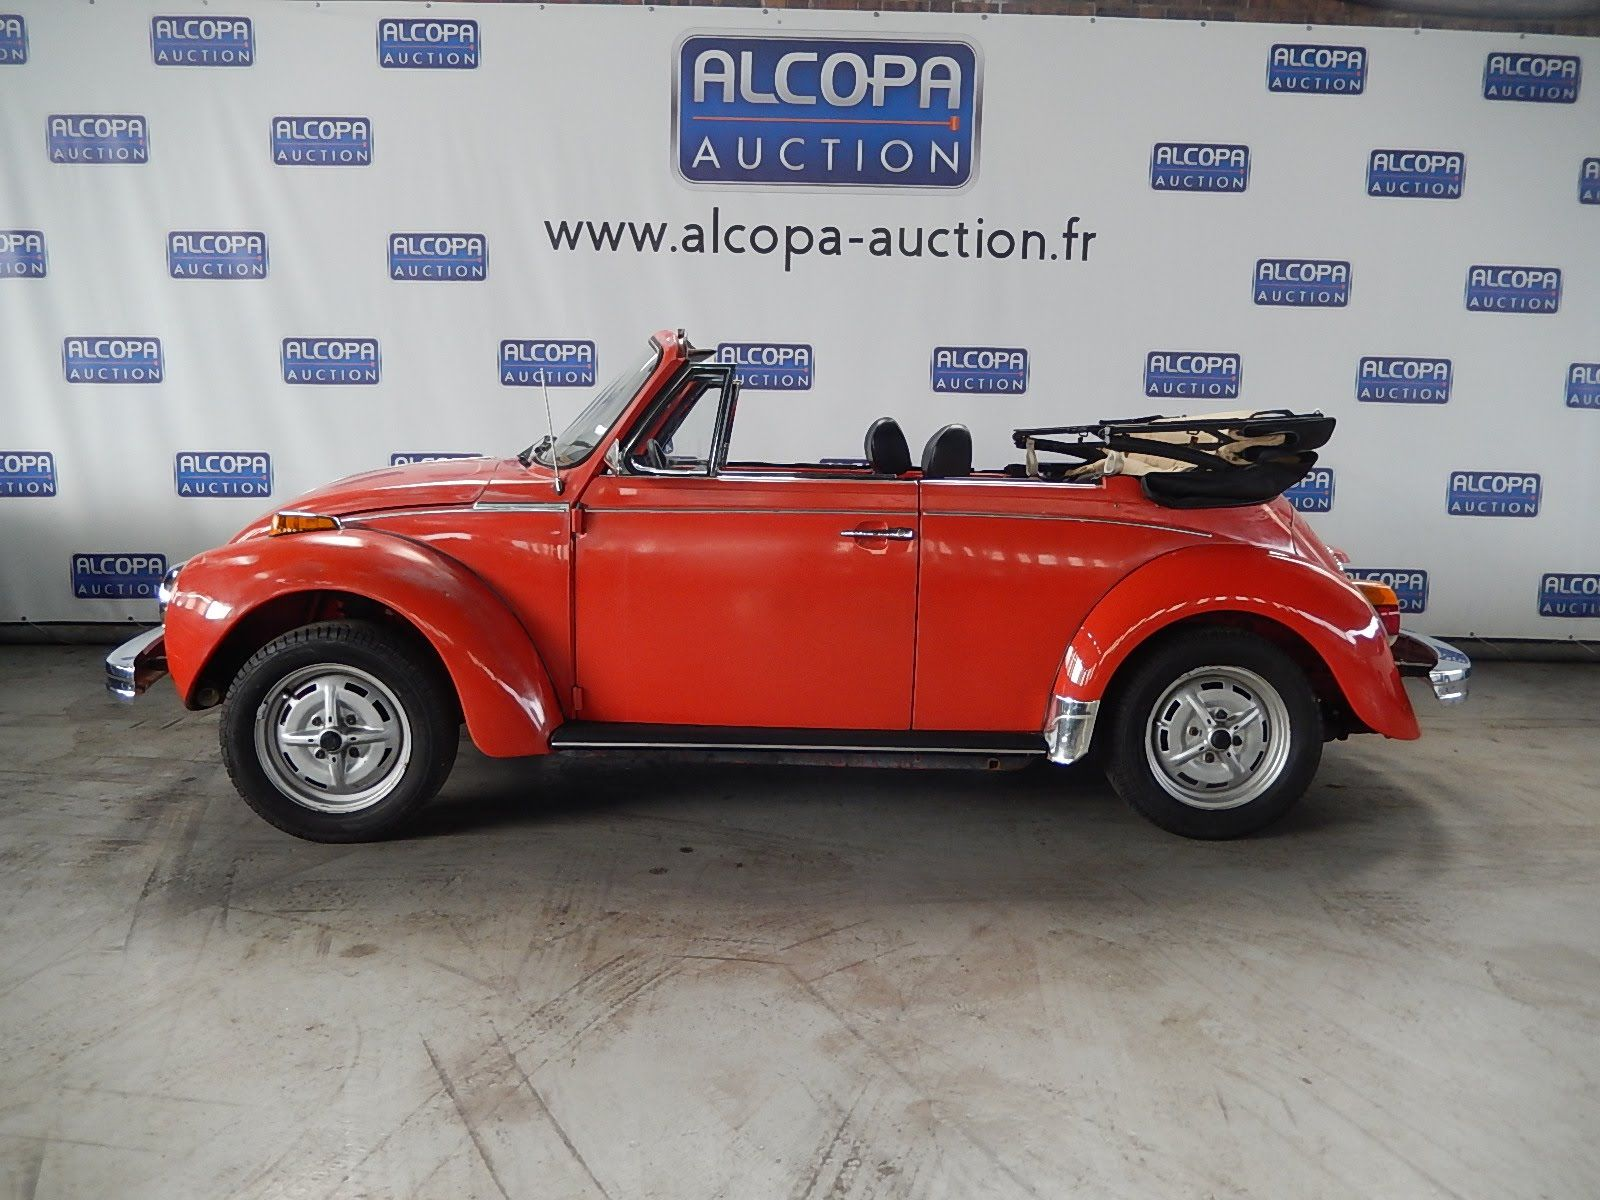 volkswagen coccinelle cabriolet alcopa auction. Black Bedroom Furniture Sets. Home Design Ideas